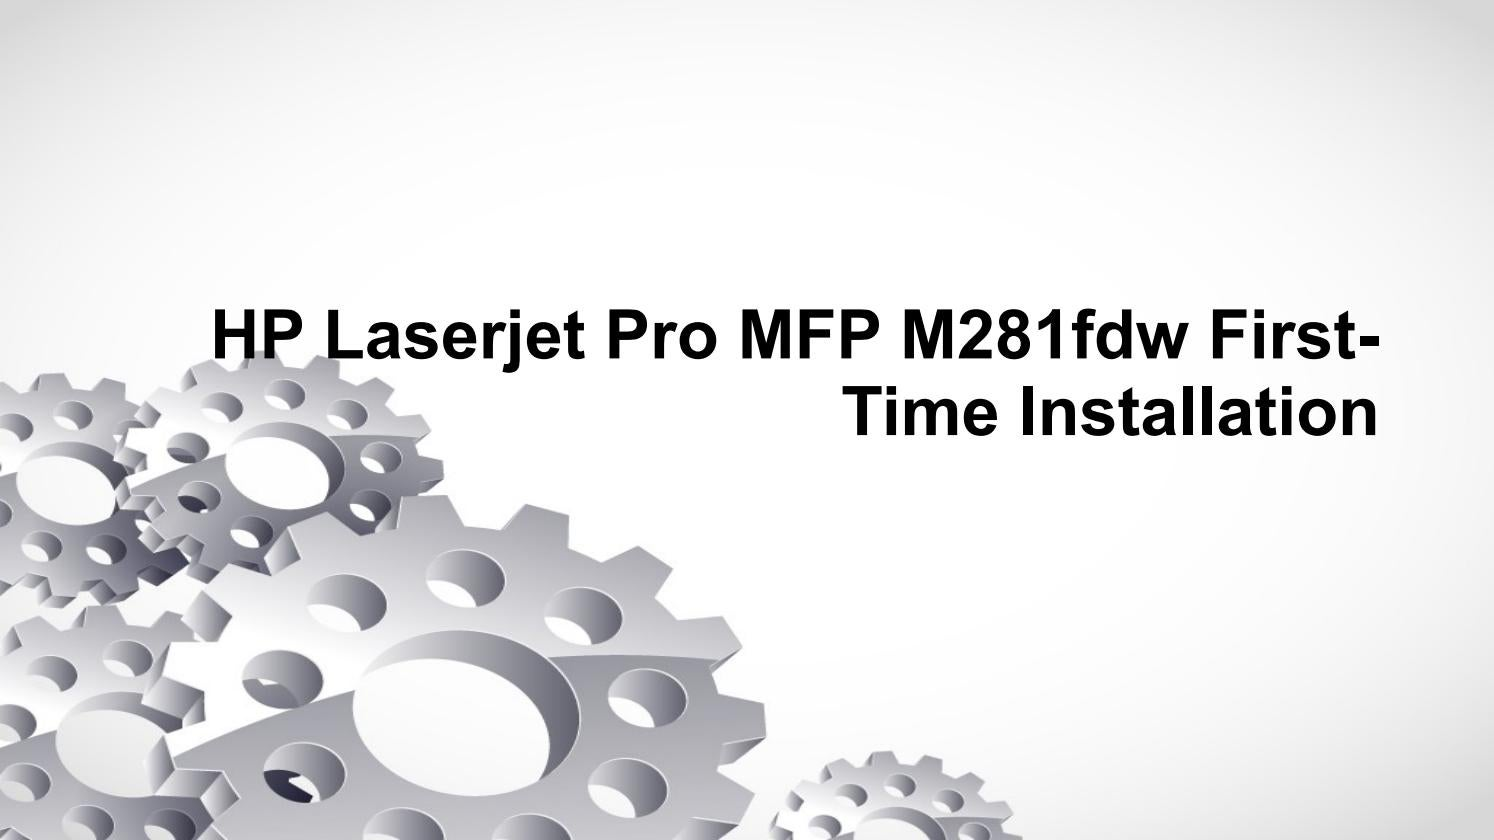 driver hp laserjet pro mfp m281fdw